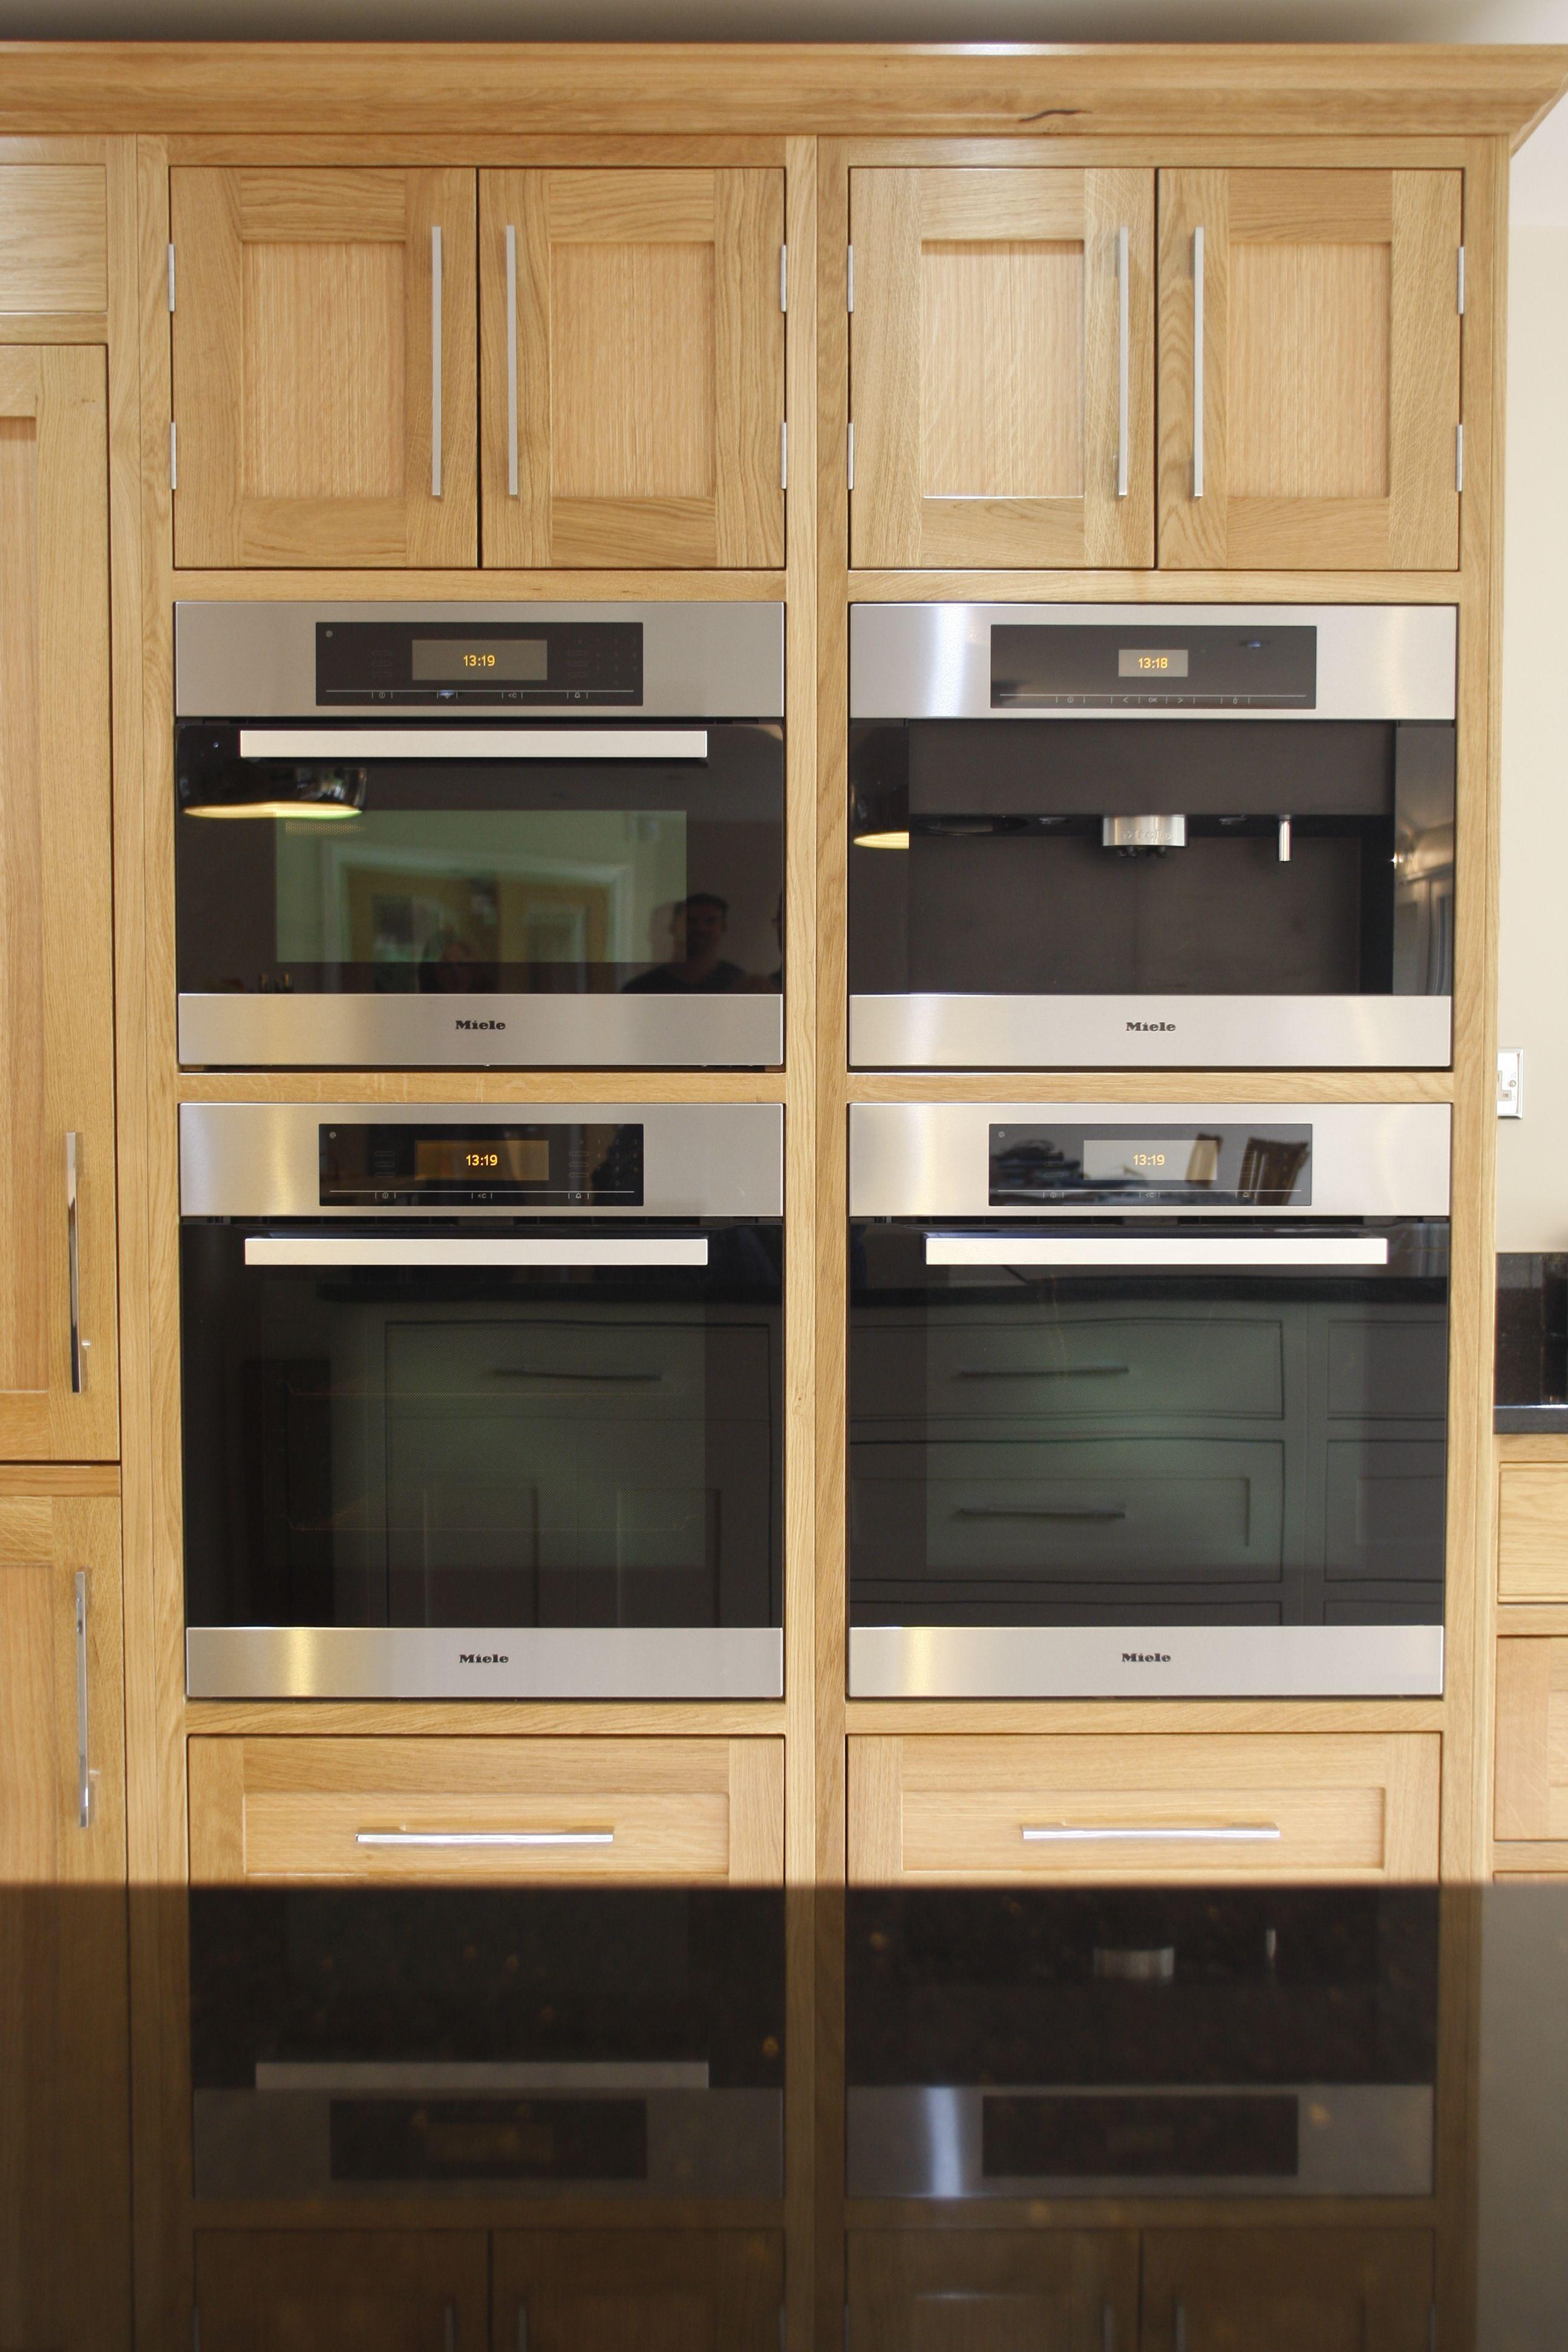 Double oven sets - Kosher Kitchens #KosherKItchens #TWKC ...